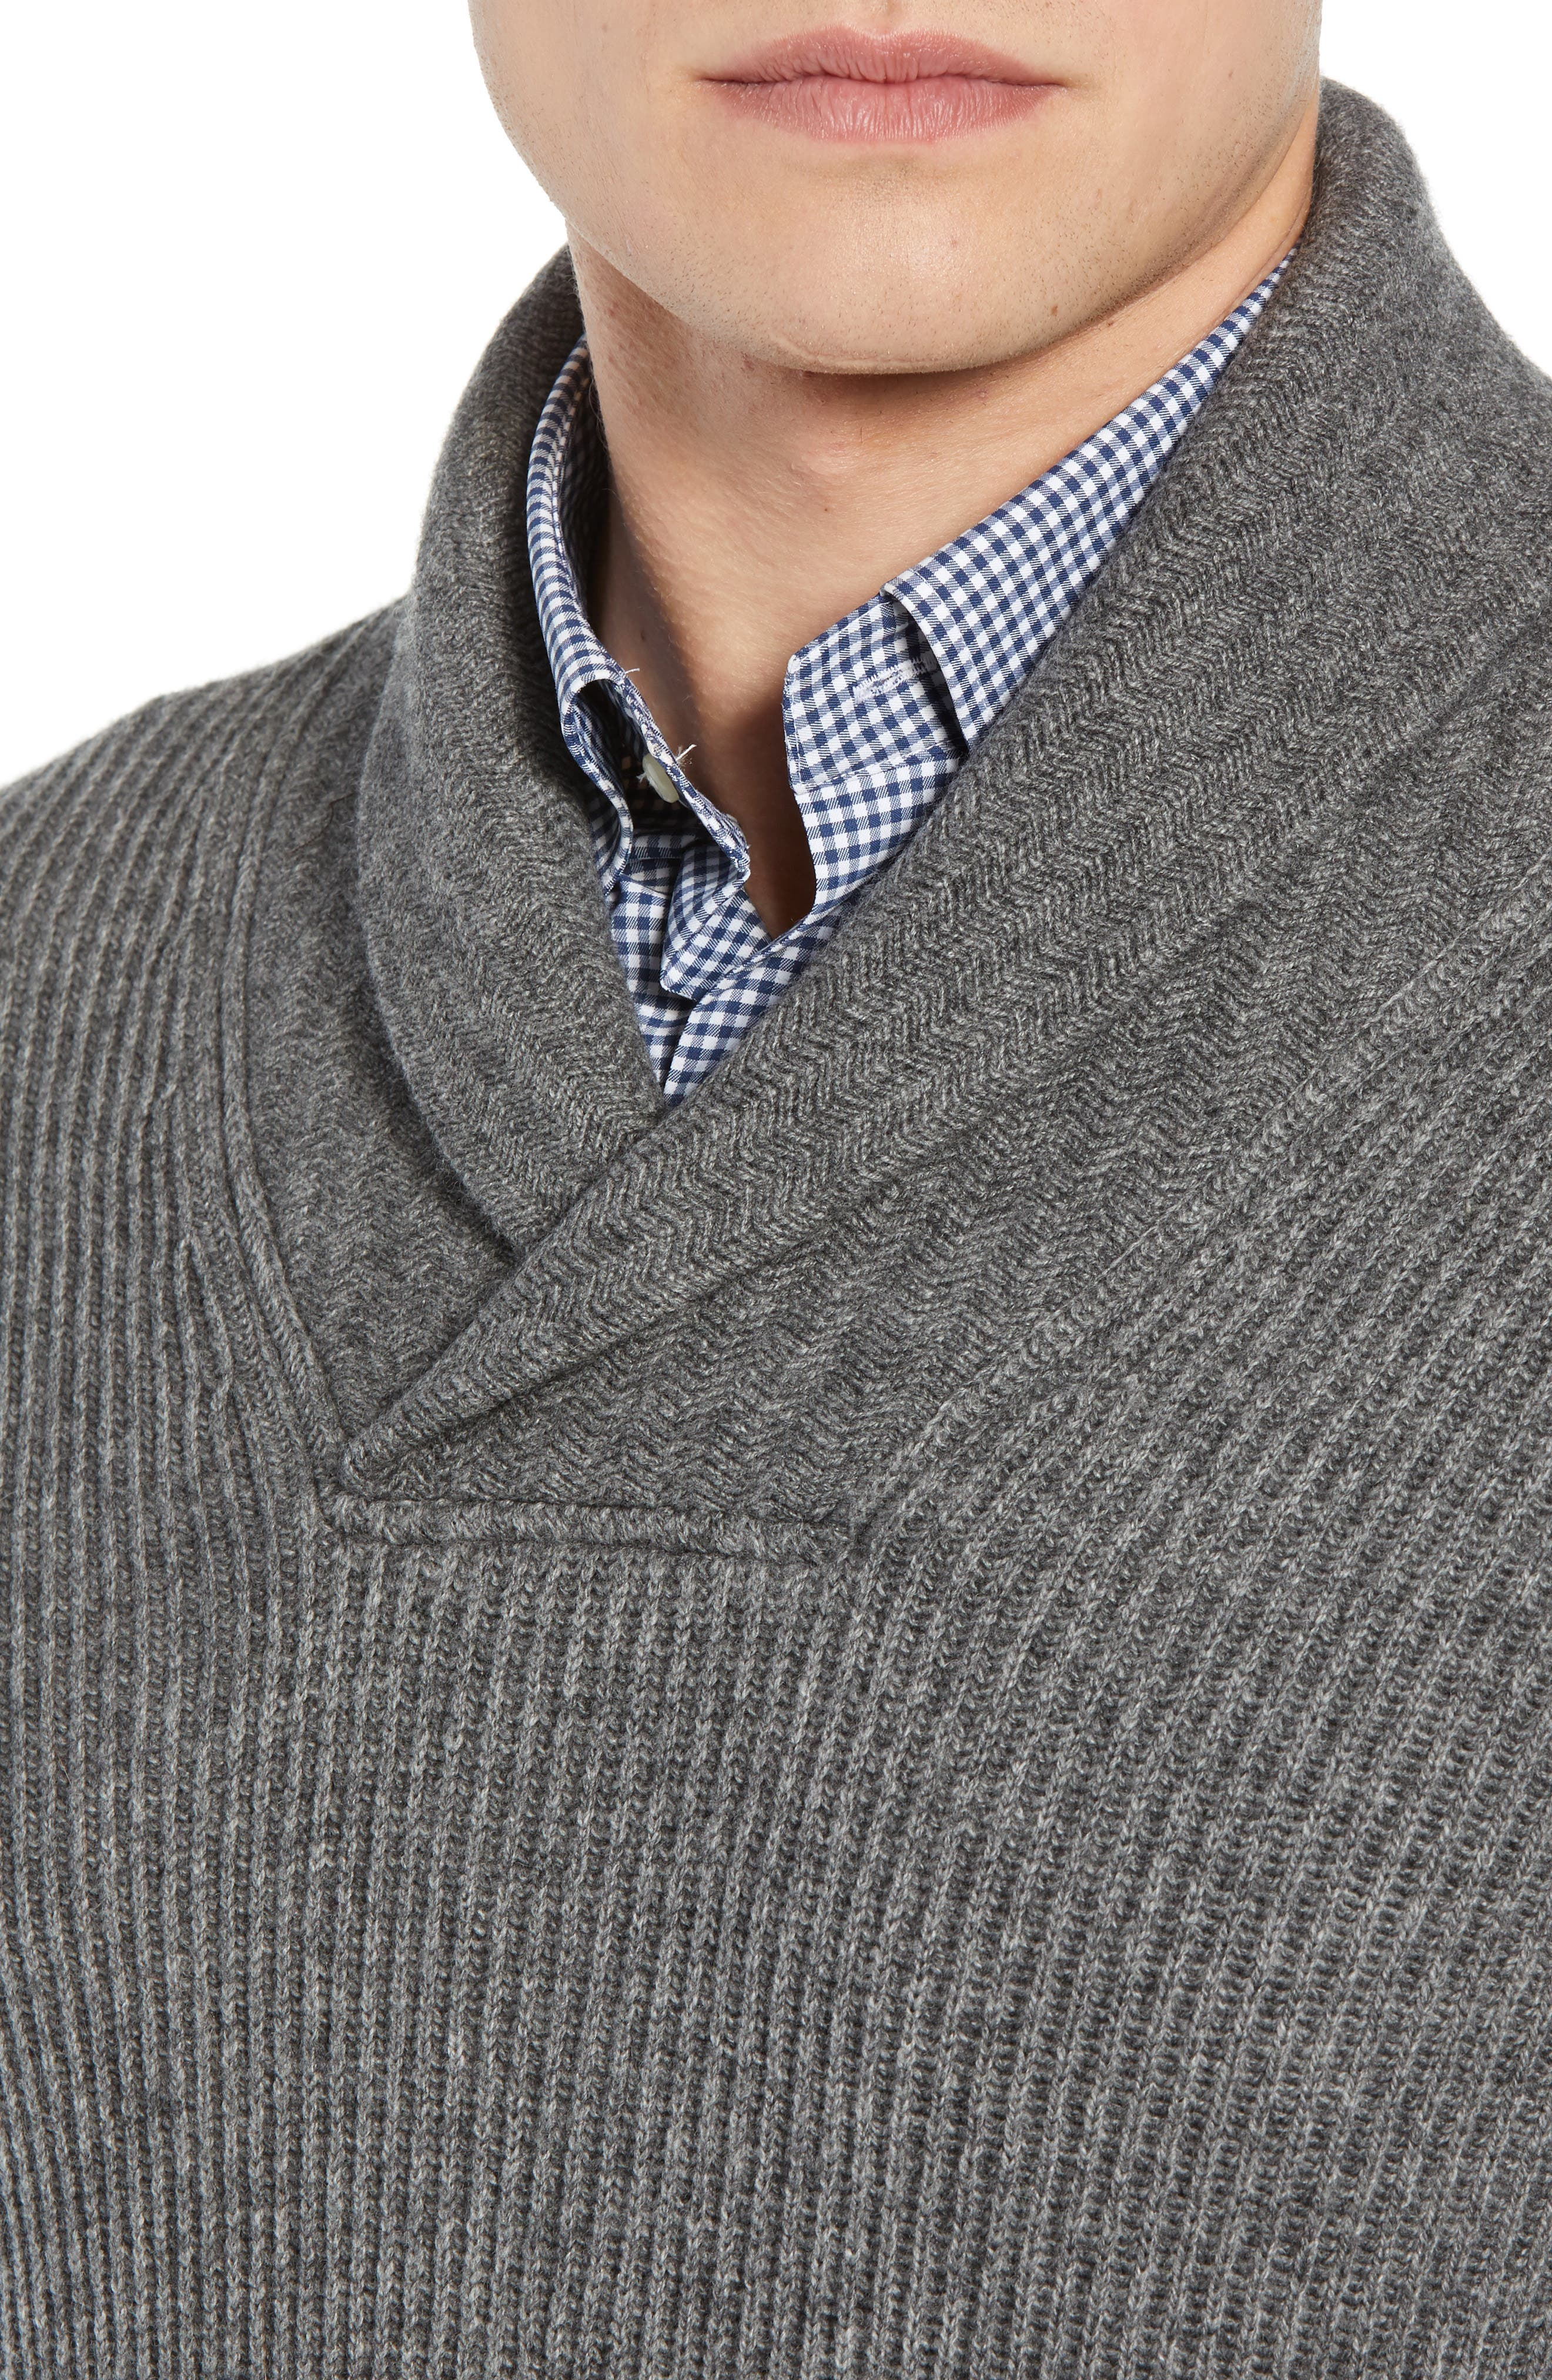 Mountainside Wool Blend Shawl Sweater,                             Alternate thumbnail 4, color,                             GREY